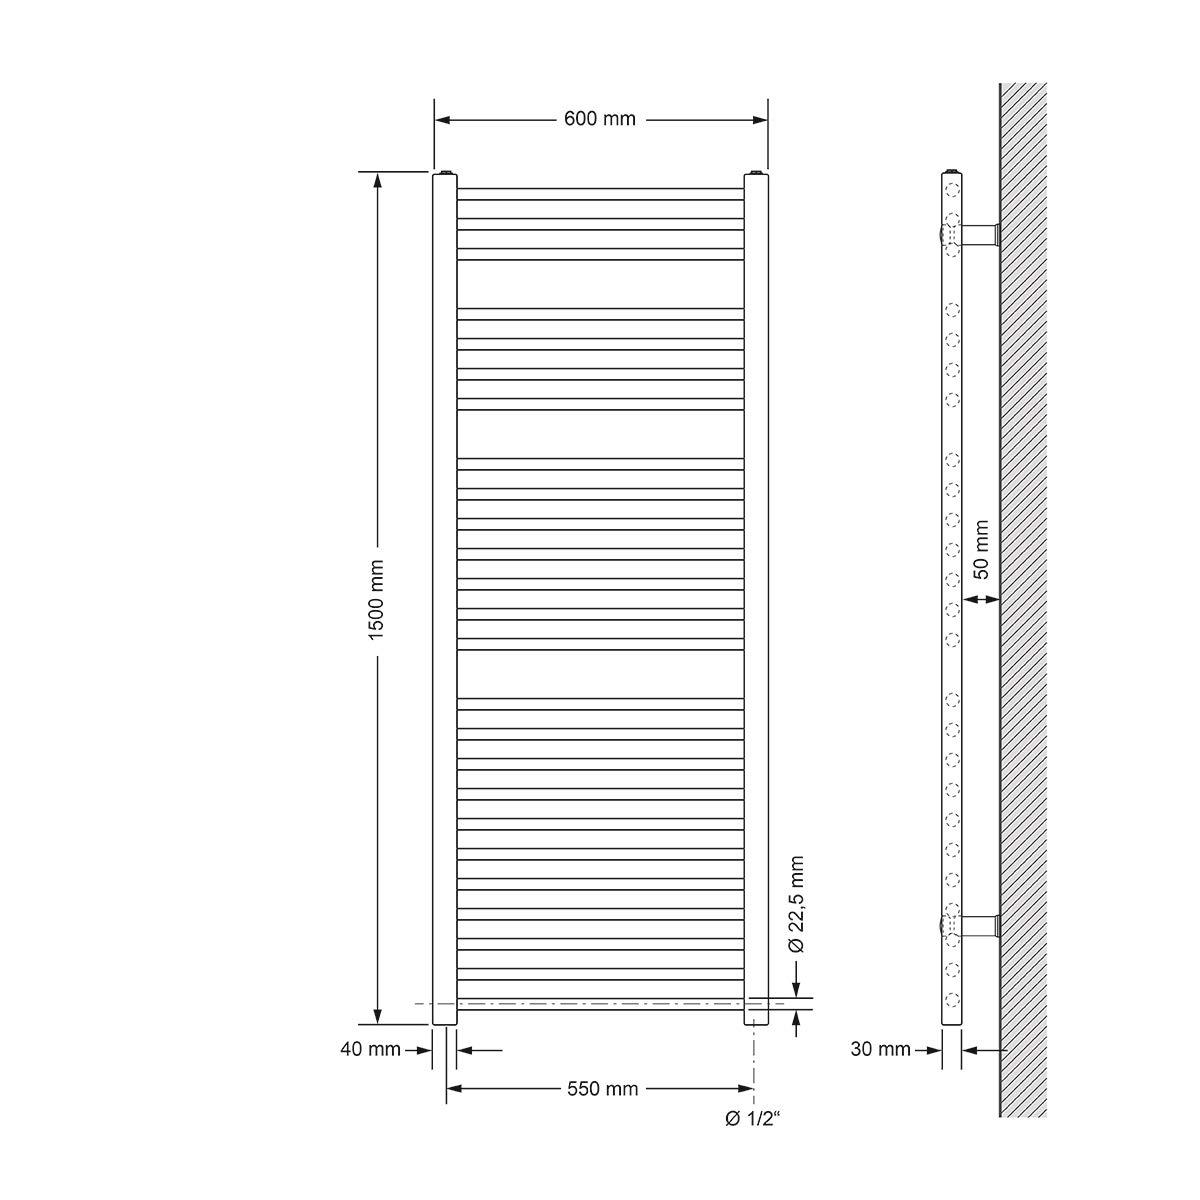 Radiador Calentador de toallas Secador de toallas 300W 500 x 800 mm ECD Germany Radiador el/éctrico de toallas curvado con conexi/ón lateral Blanco